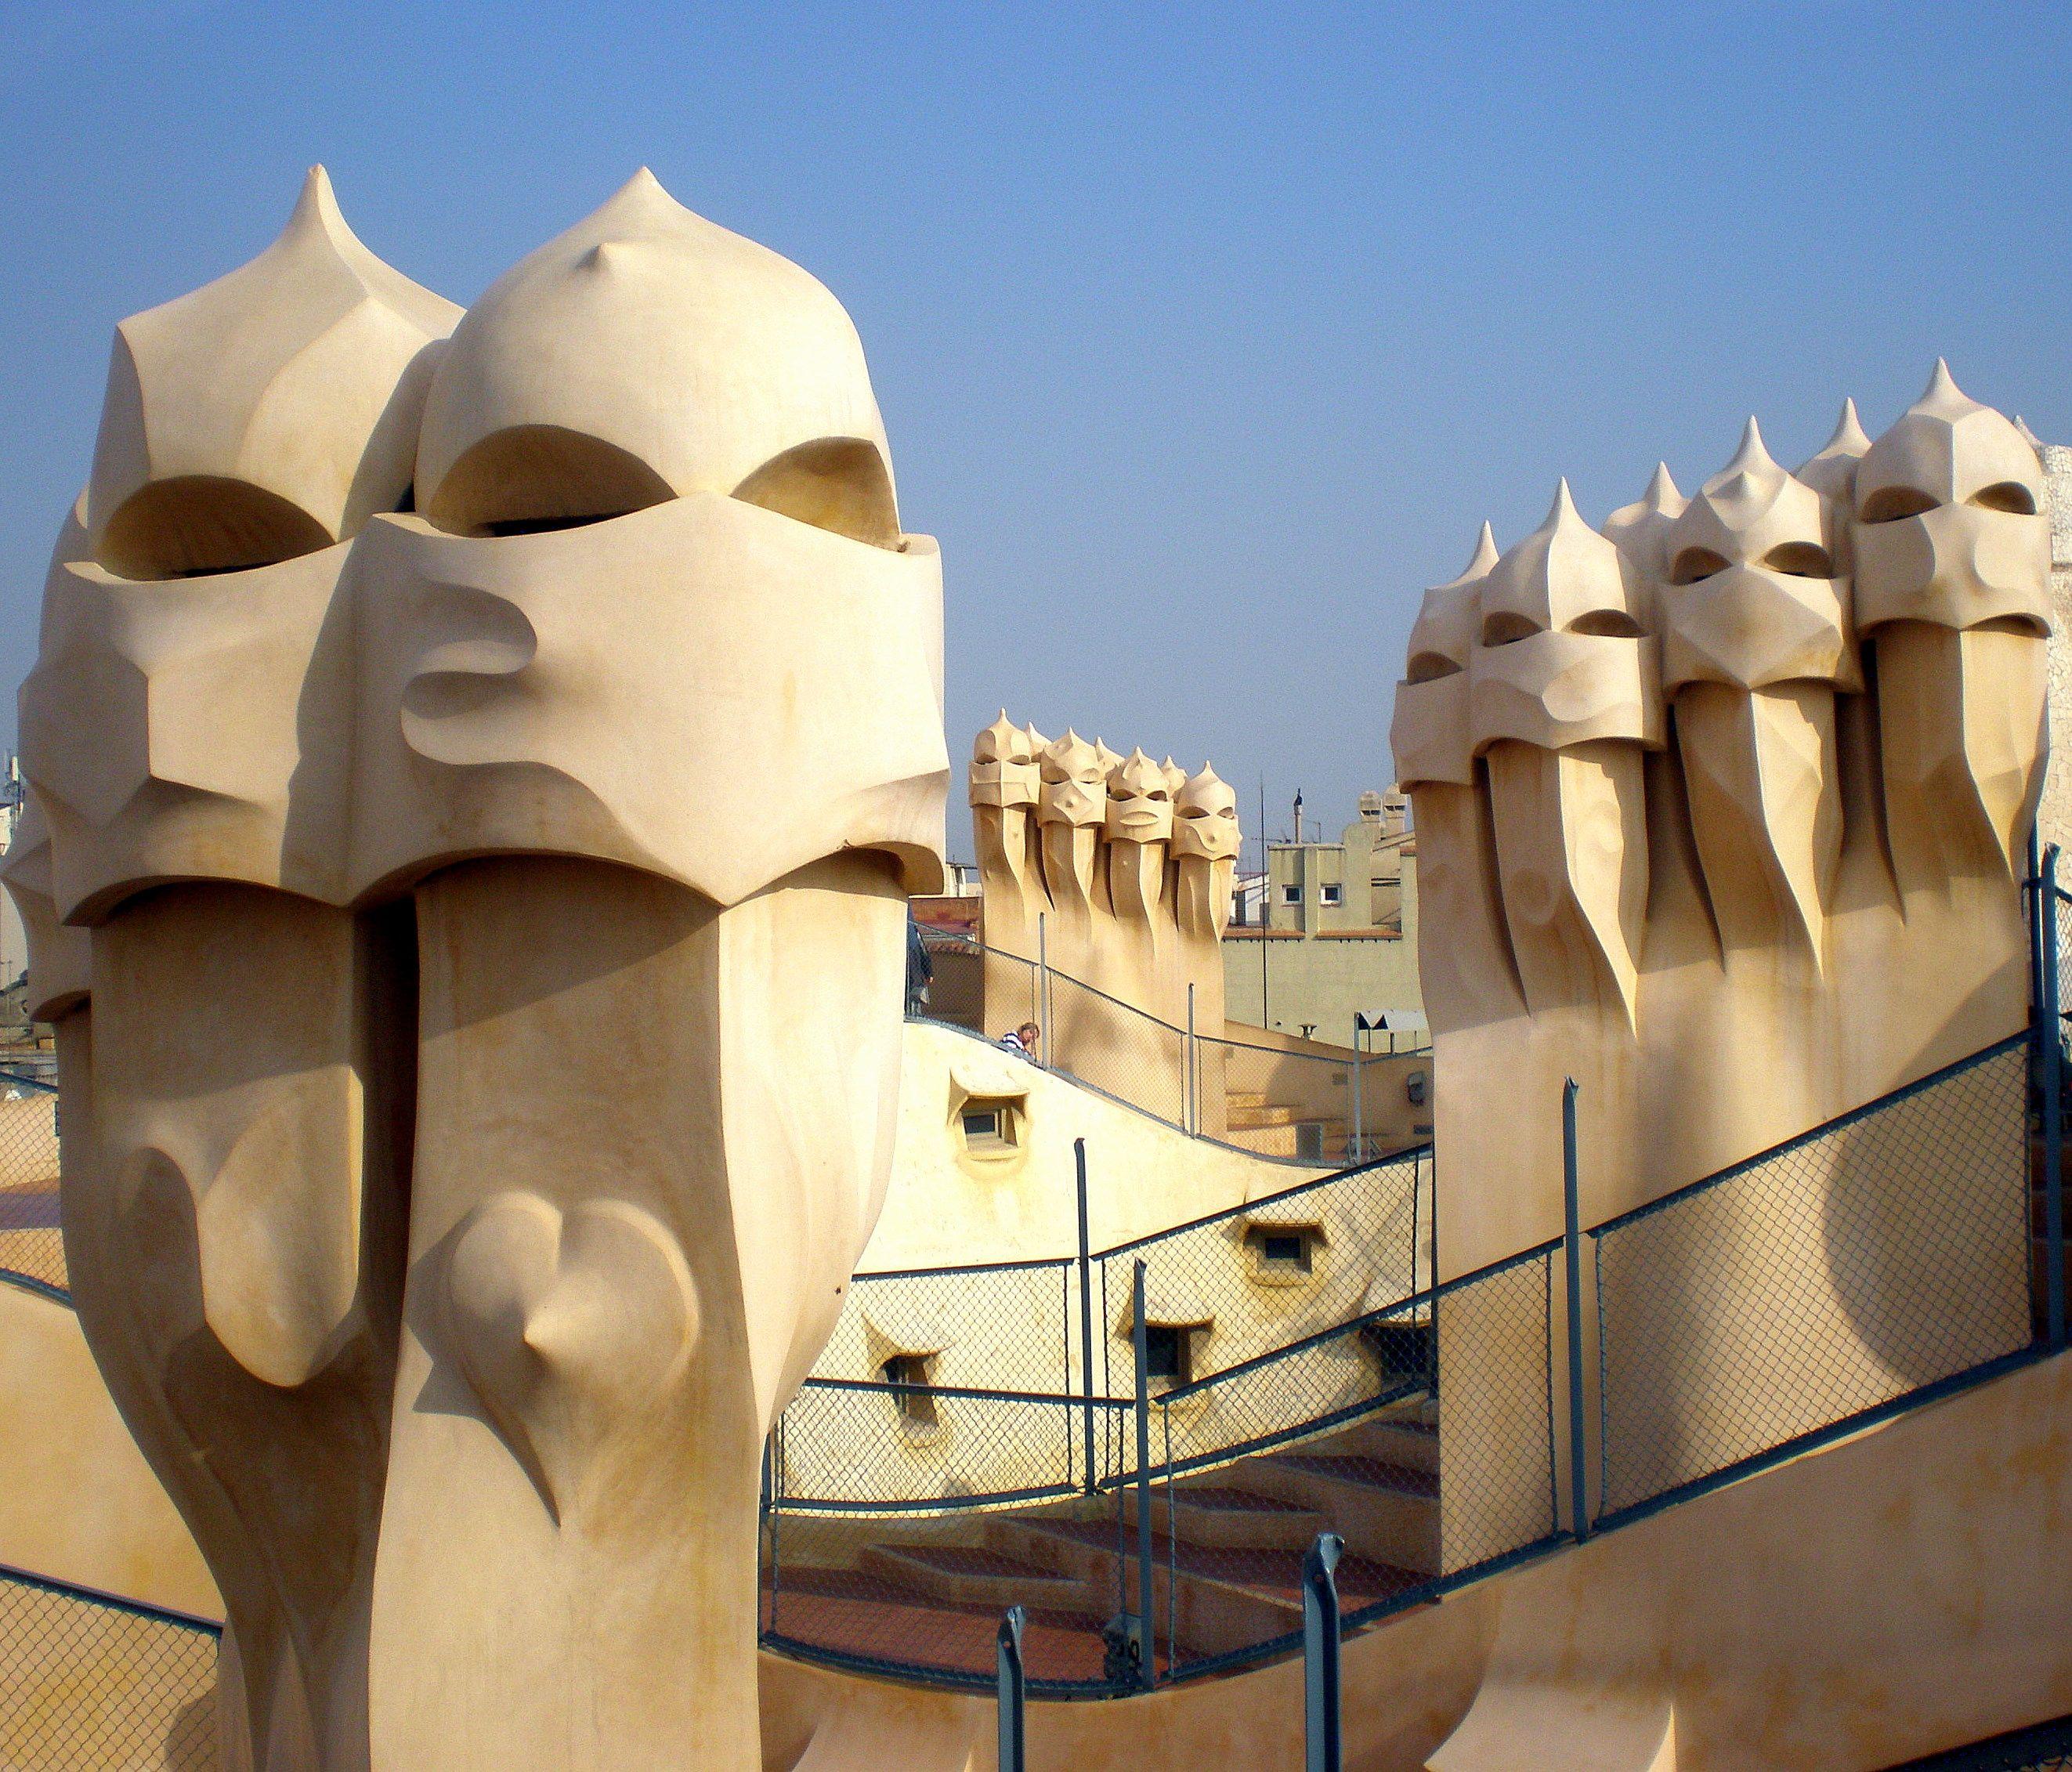 Imagem de http://www.barcelonapoint.com/en/blog/files/2013/04/pedrera-rooftop.jpg.